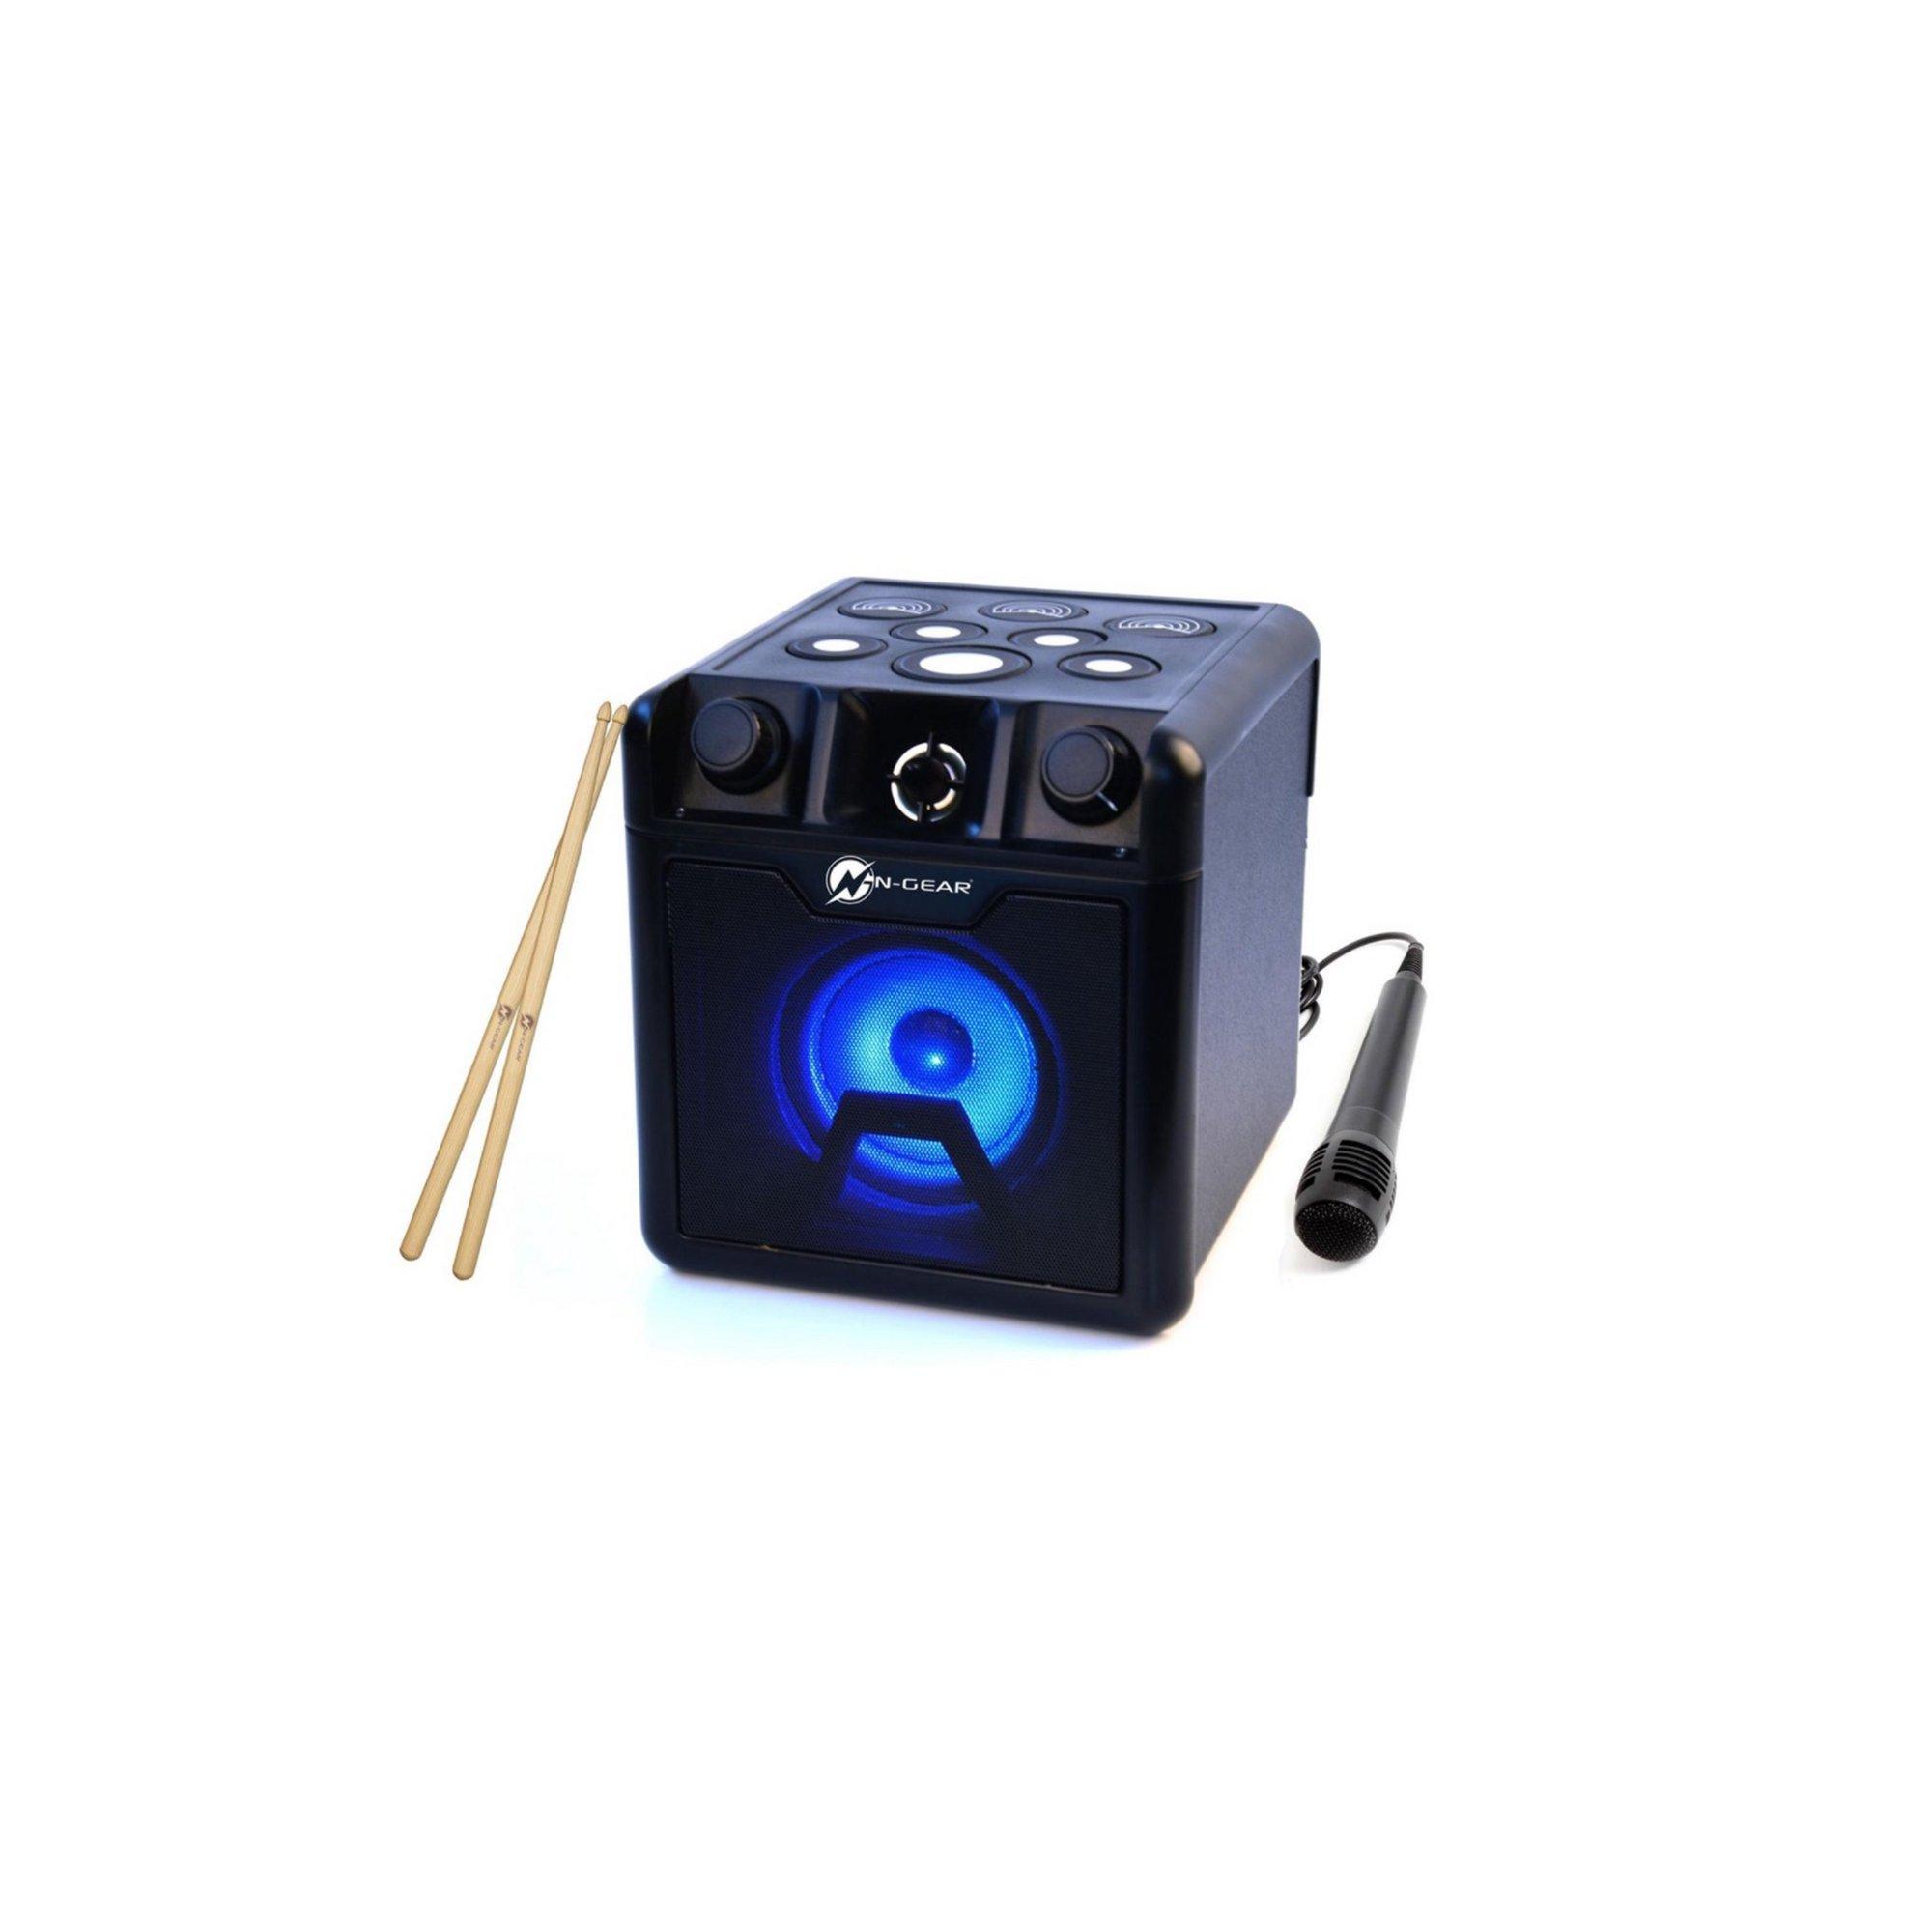 Image of Drum Block 420 Karaoke Machine